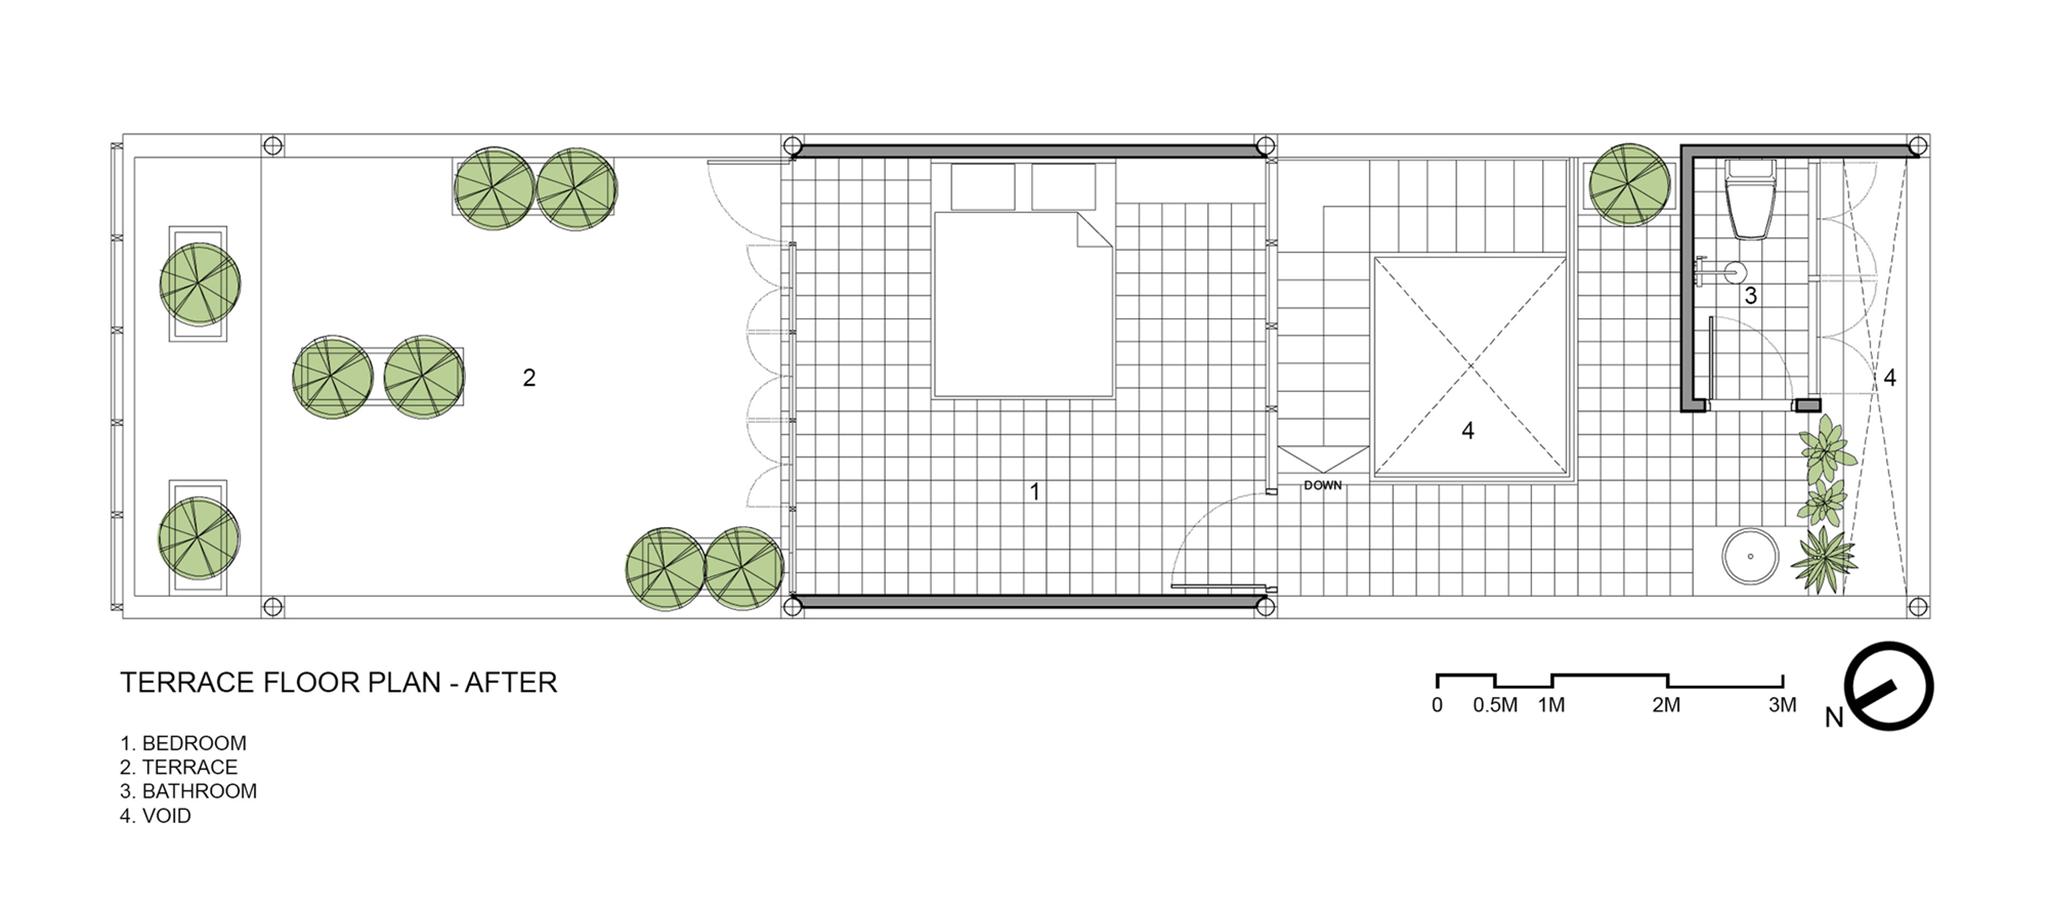 557a5bb9e58eced6280001fd_vegan-house-block-architects_24_copia (Copy)